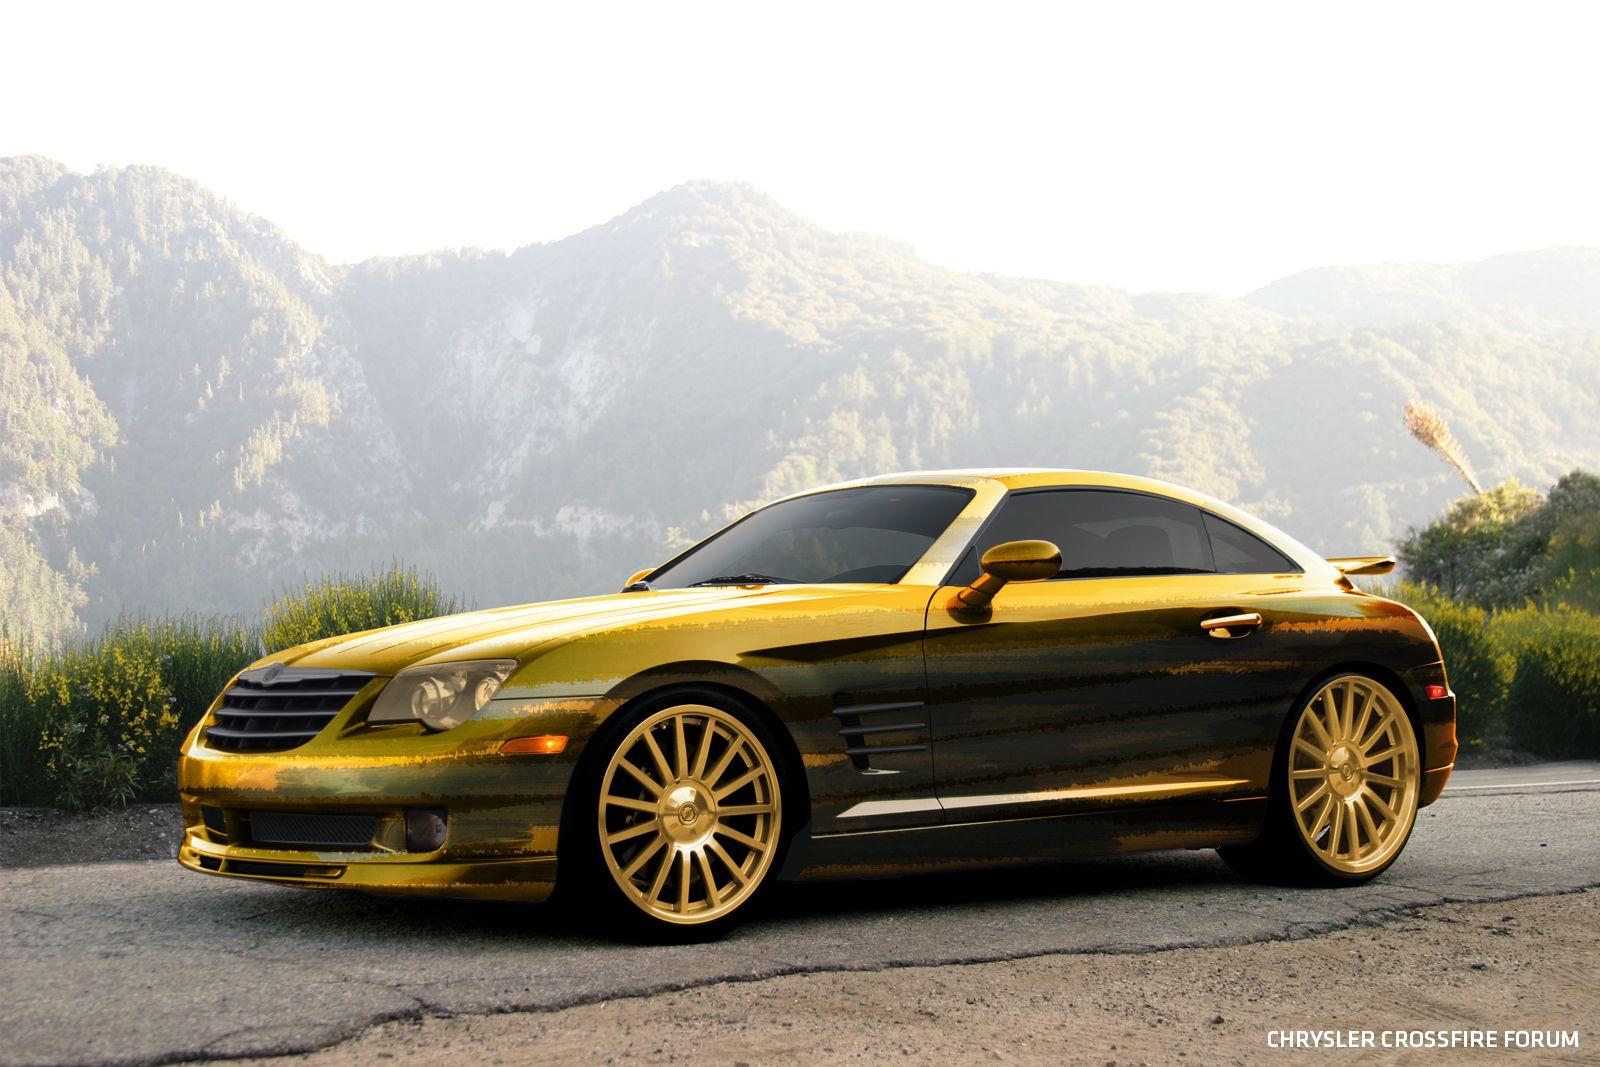 Chrysler Crossfire Golden Camo Look Crossfireforum Foose Cars